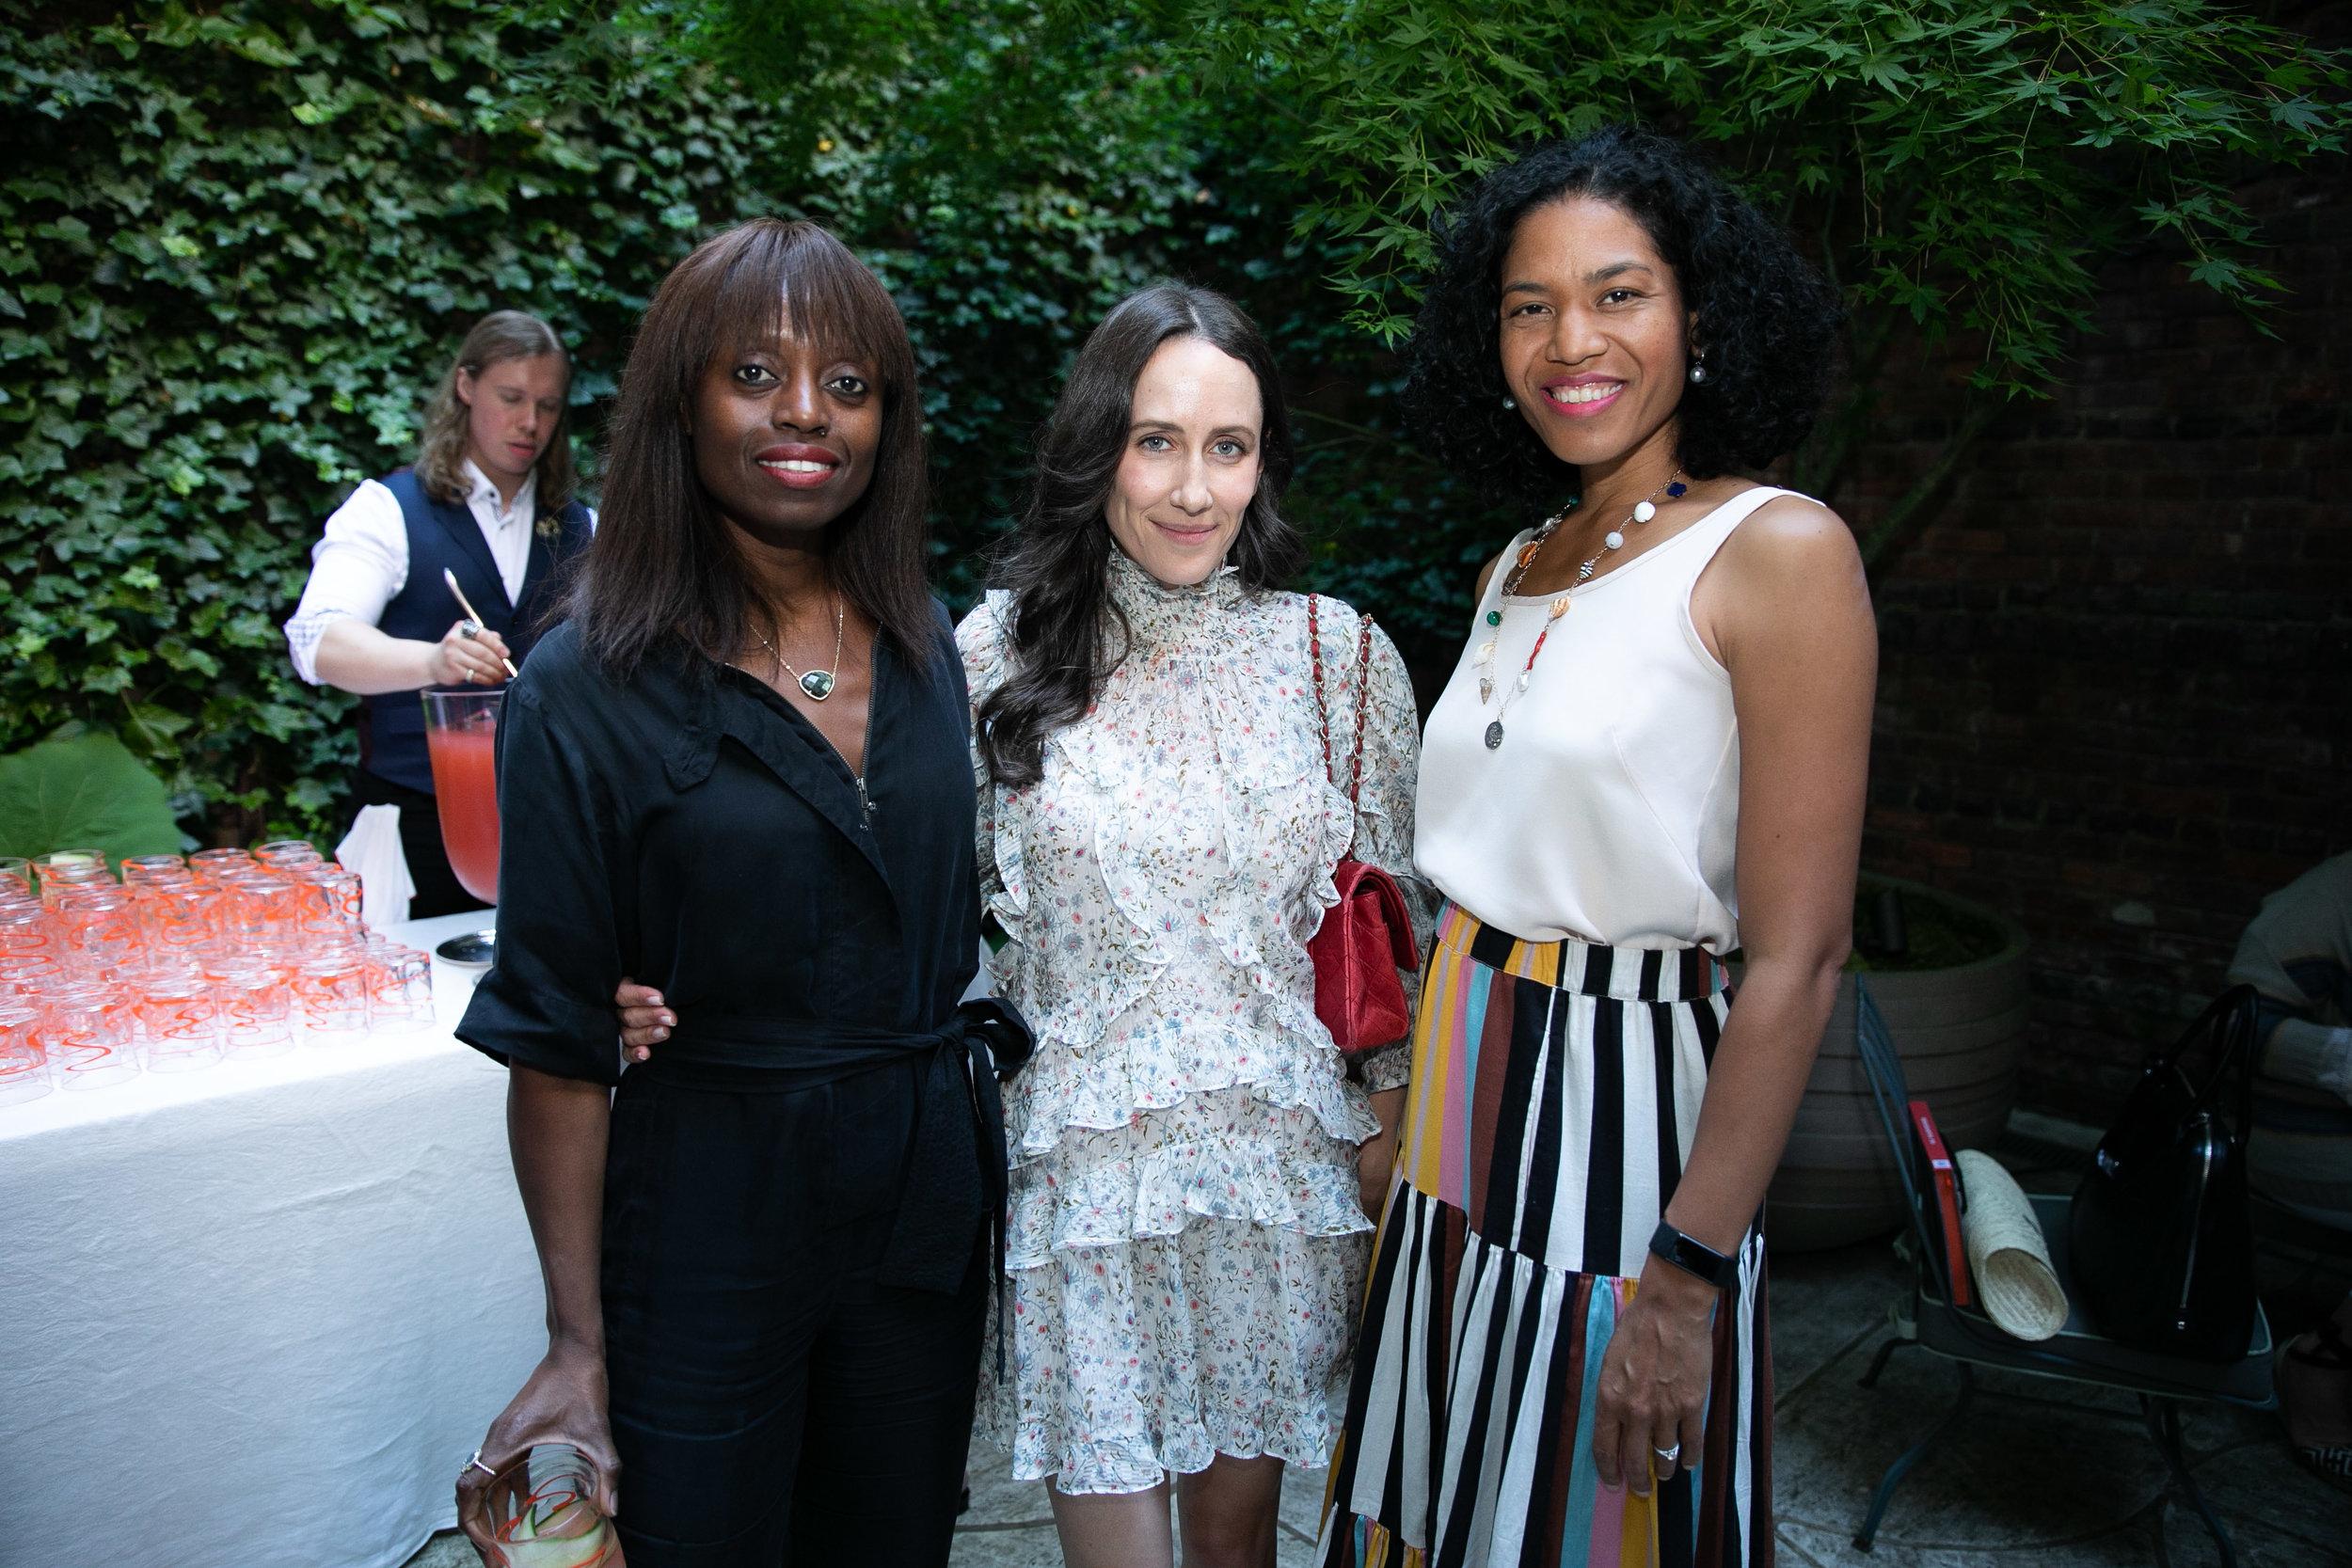 Dee Poku, Violet Gaynor, Christina Lewis.jpg